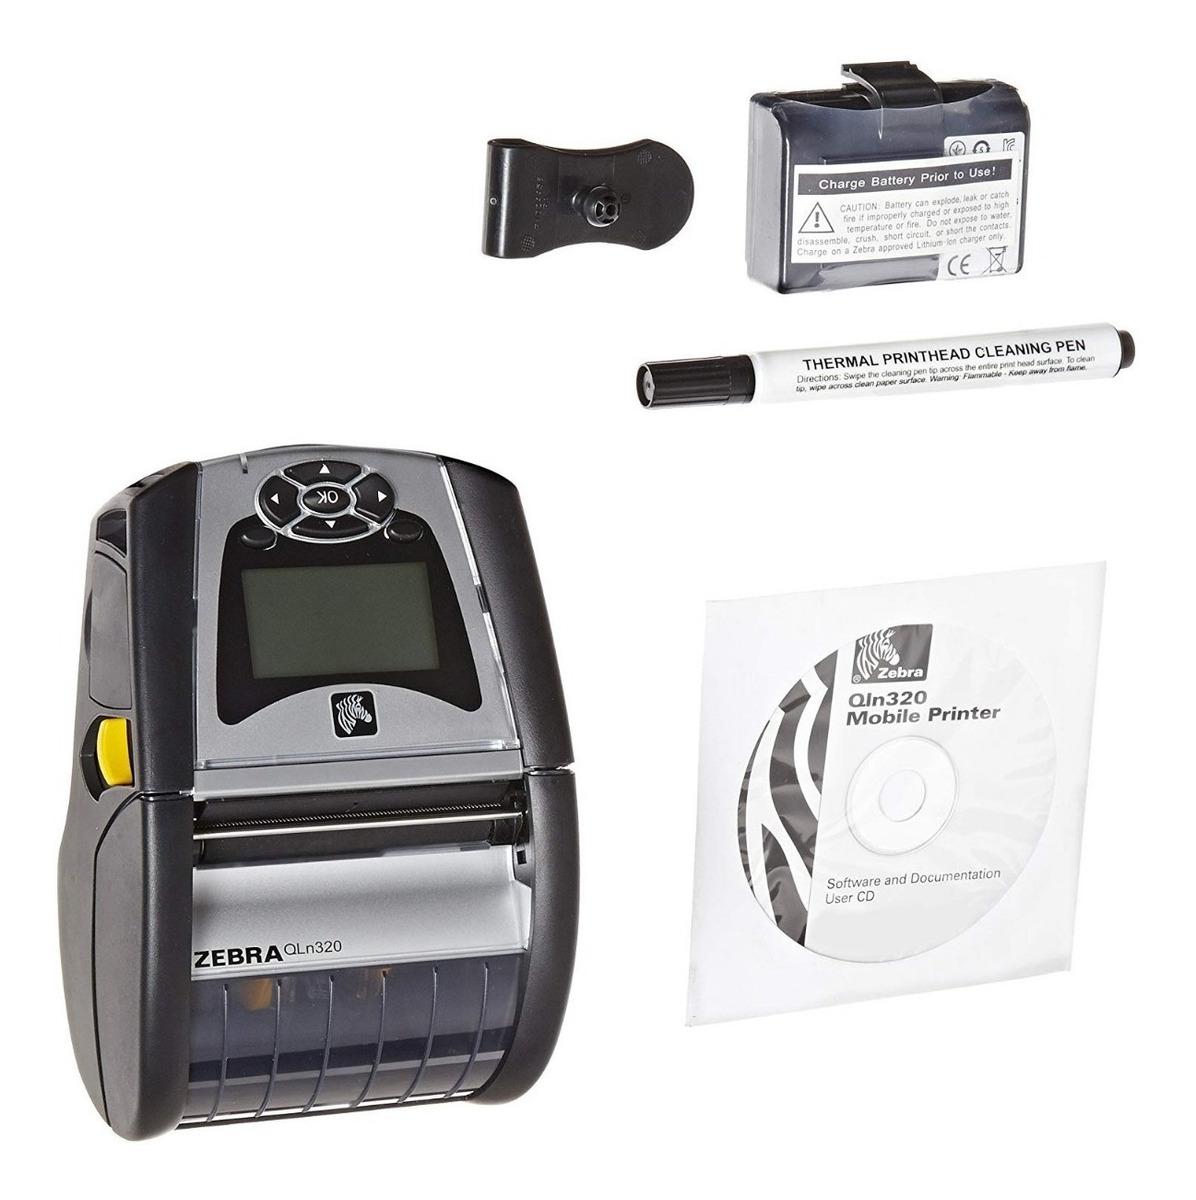 Impresora Term Port Zebra Qln320 Bluetooth 3 0 Zpl,cpcl,xml